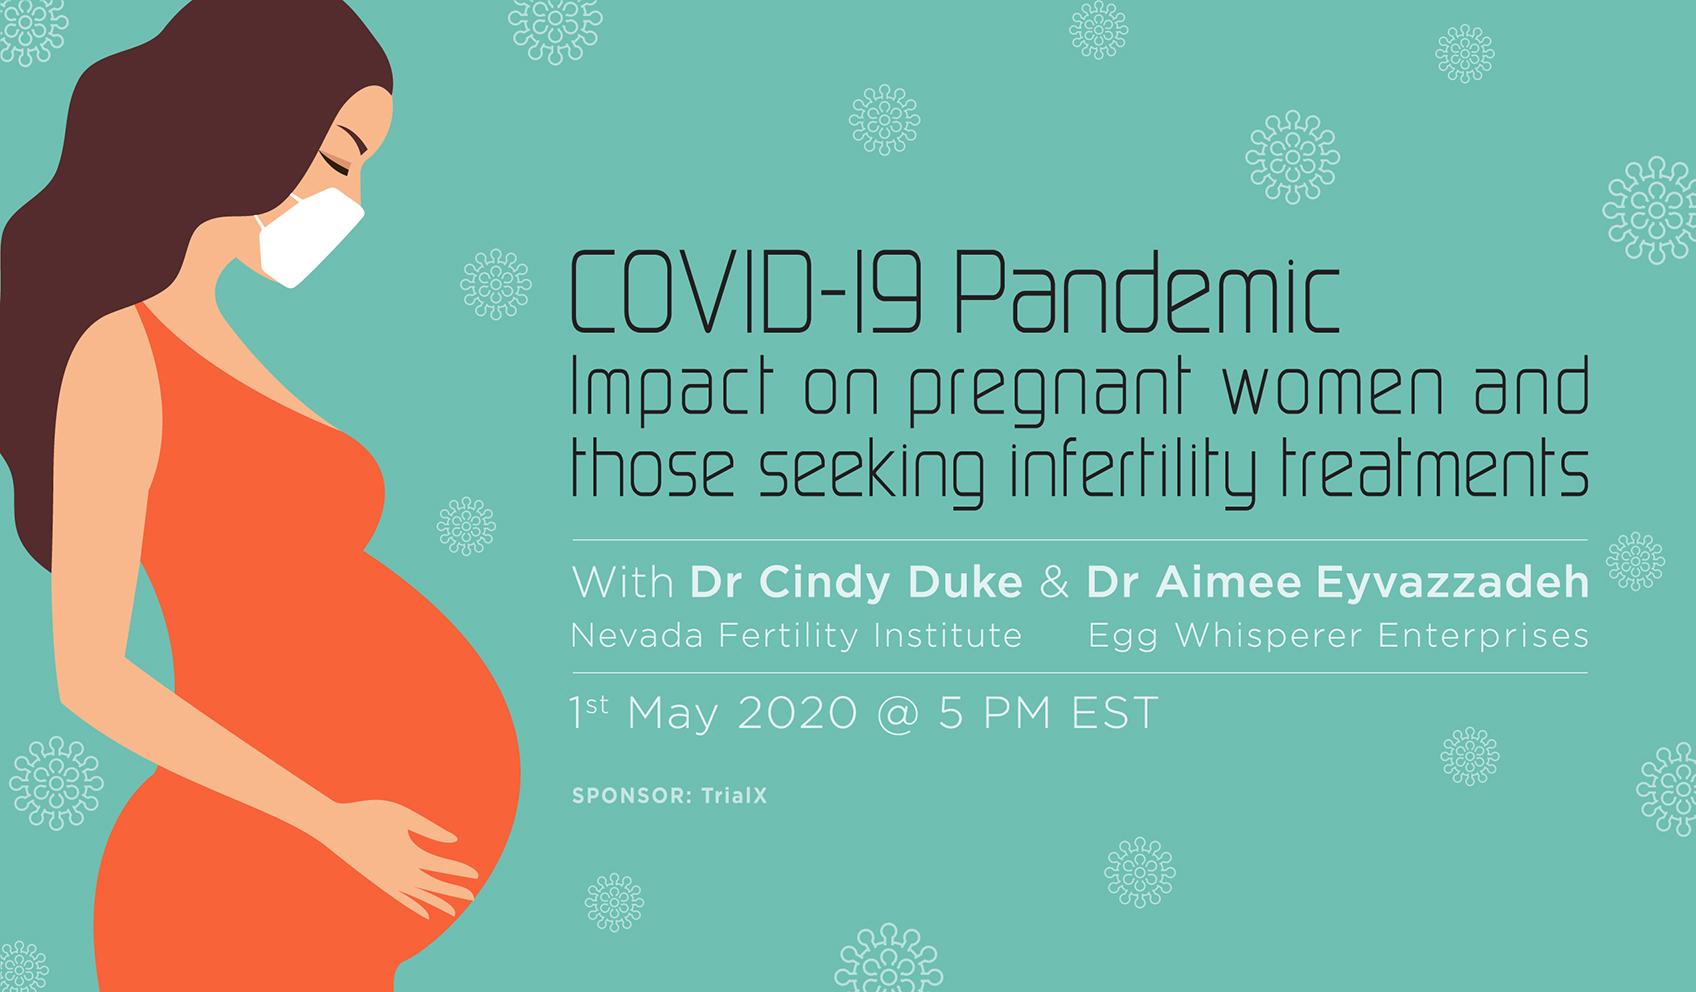 COVID19 Pandemic – Impact on Pregnant Women and Those Seeking Infertility Treatments